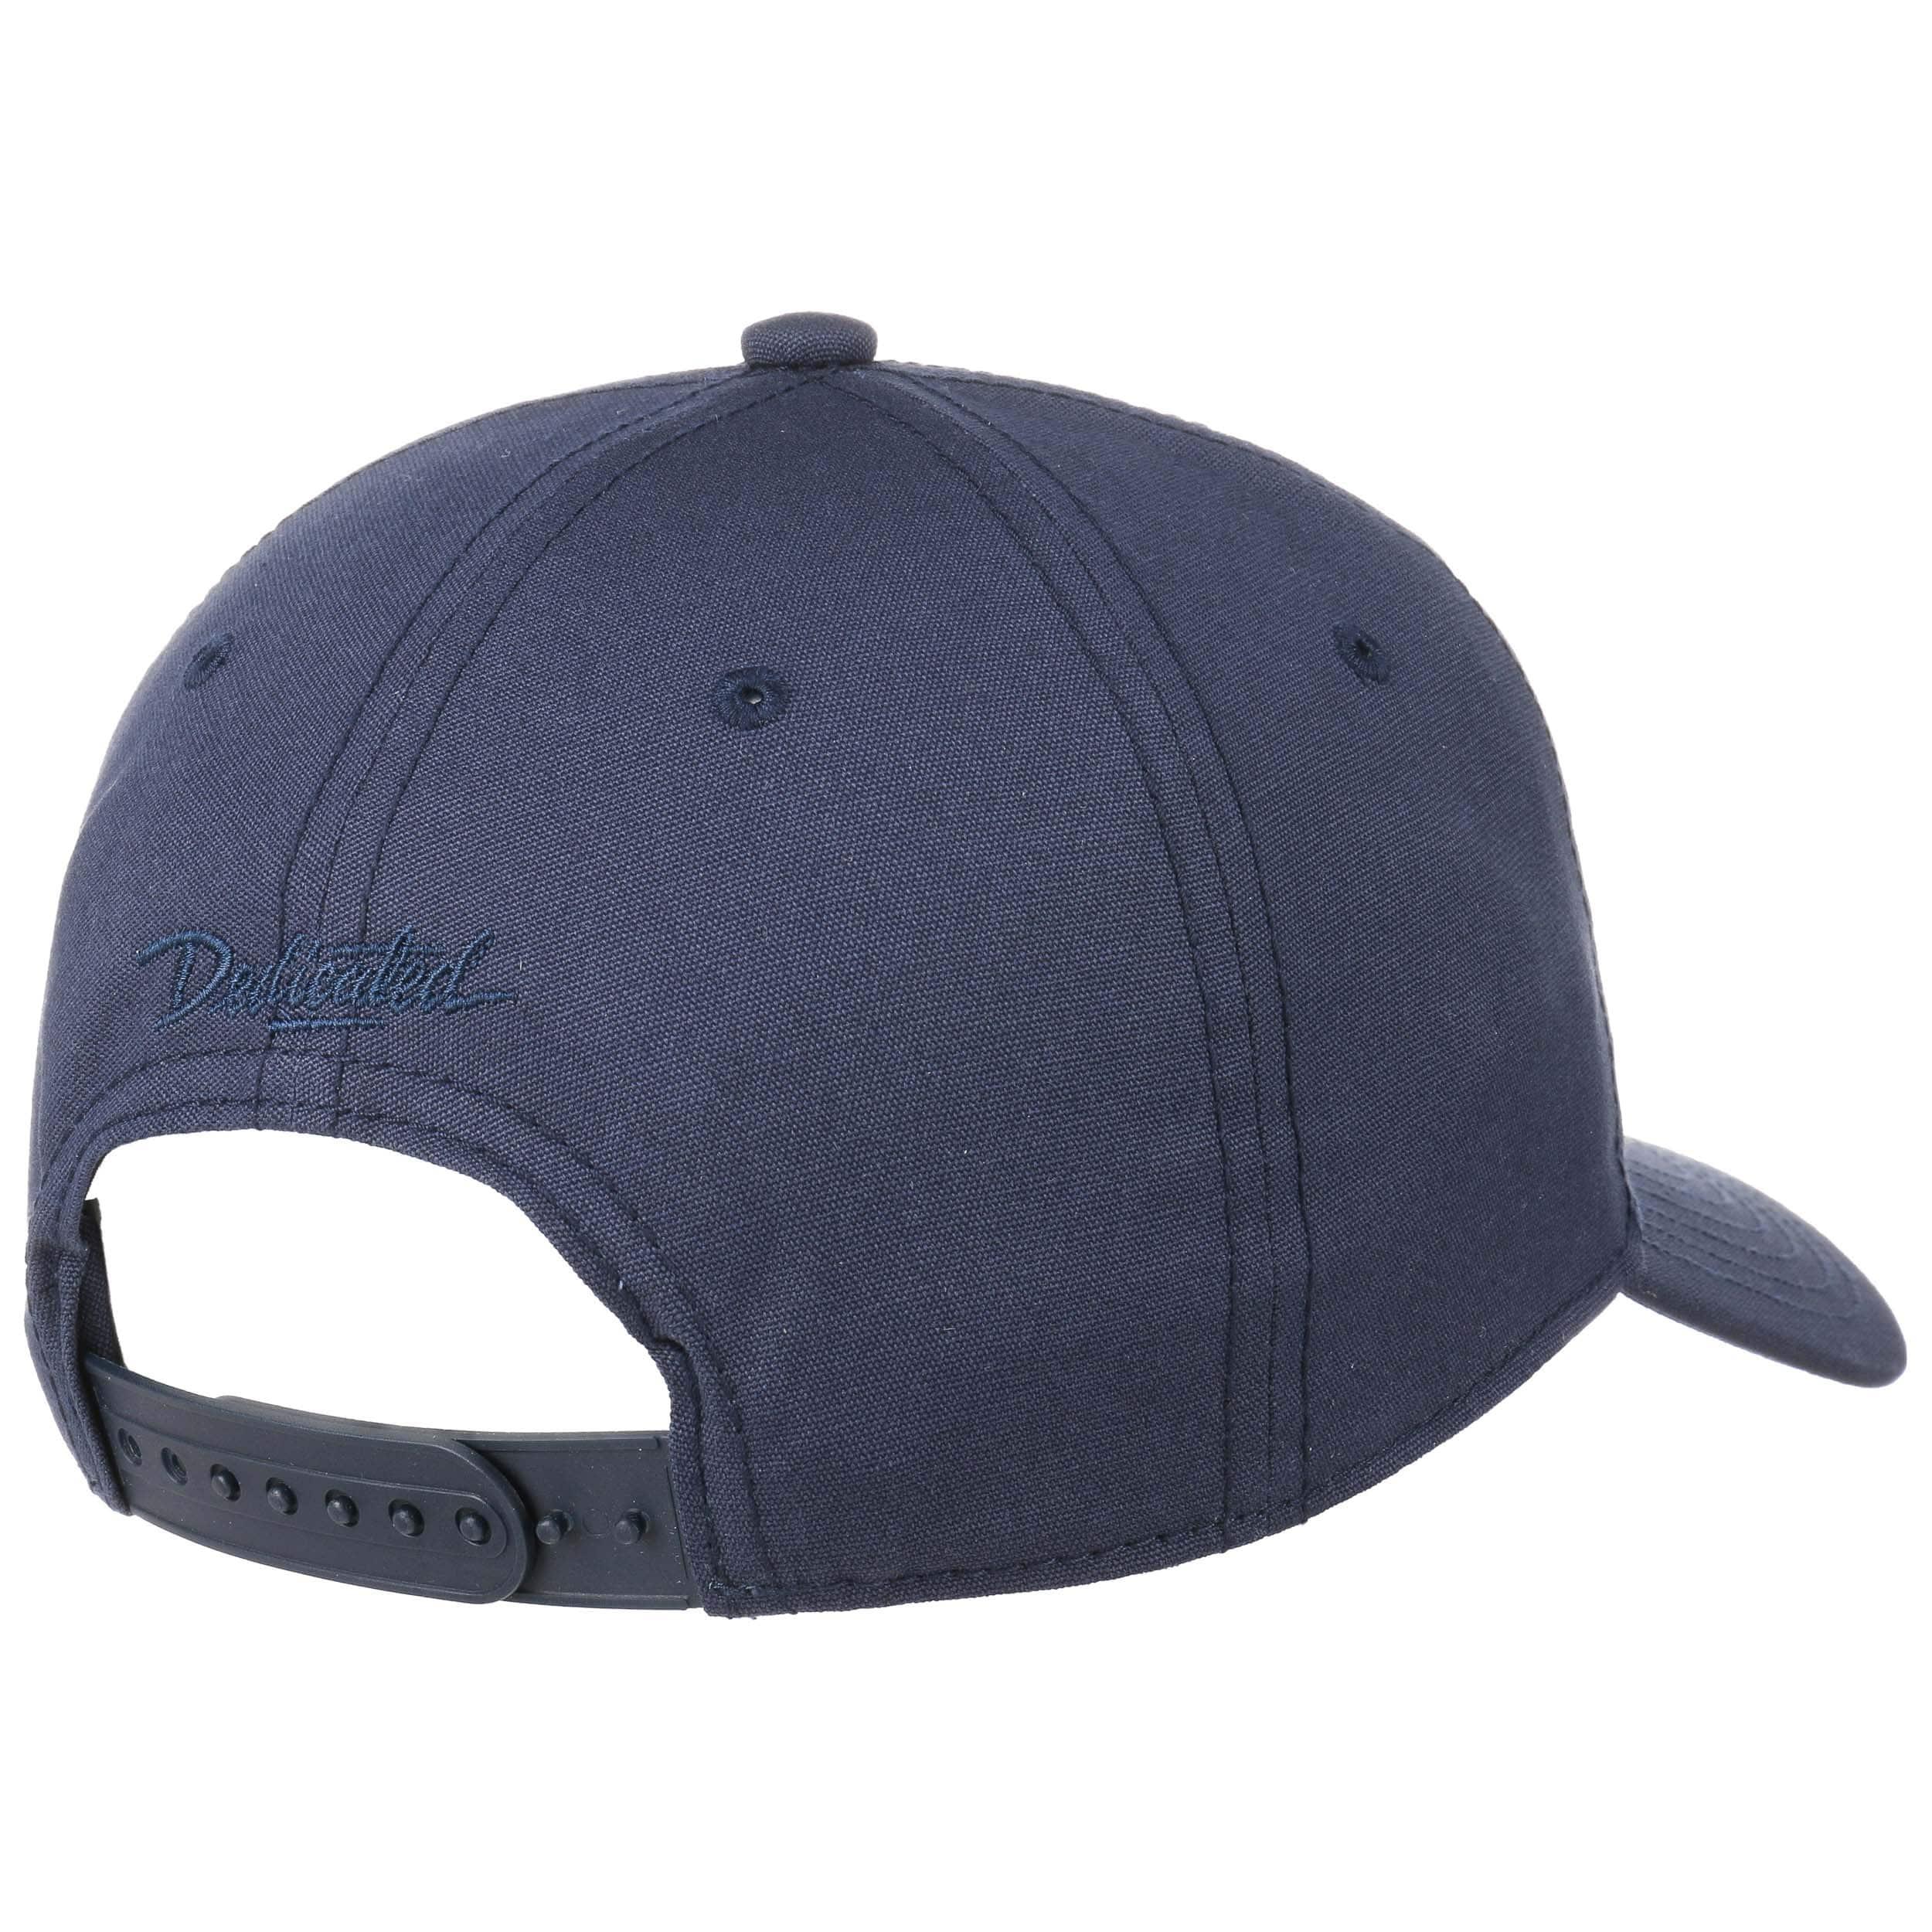 ... Luke Curved Brim Snapback Cap by dedicated - navy 3 ... 60c07f16948